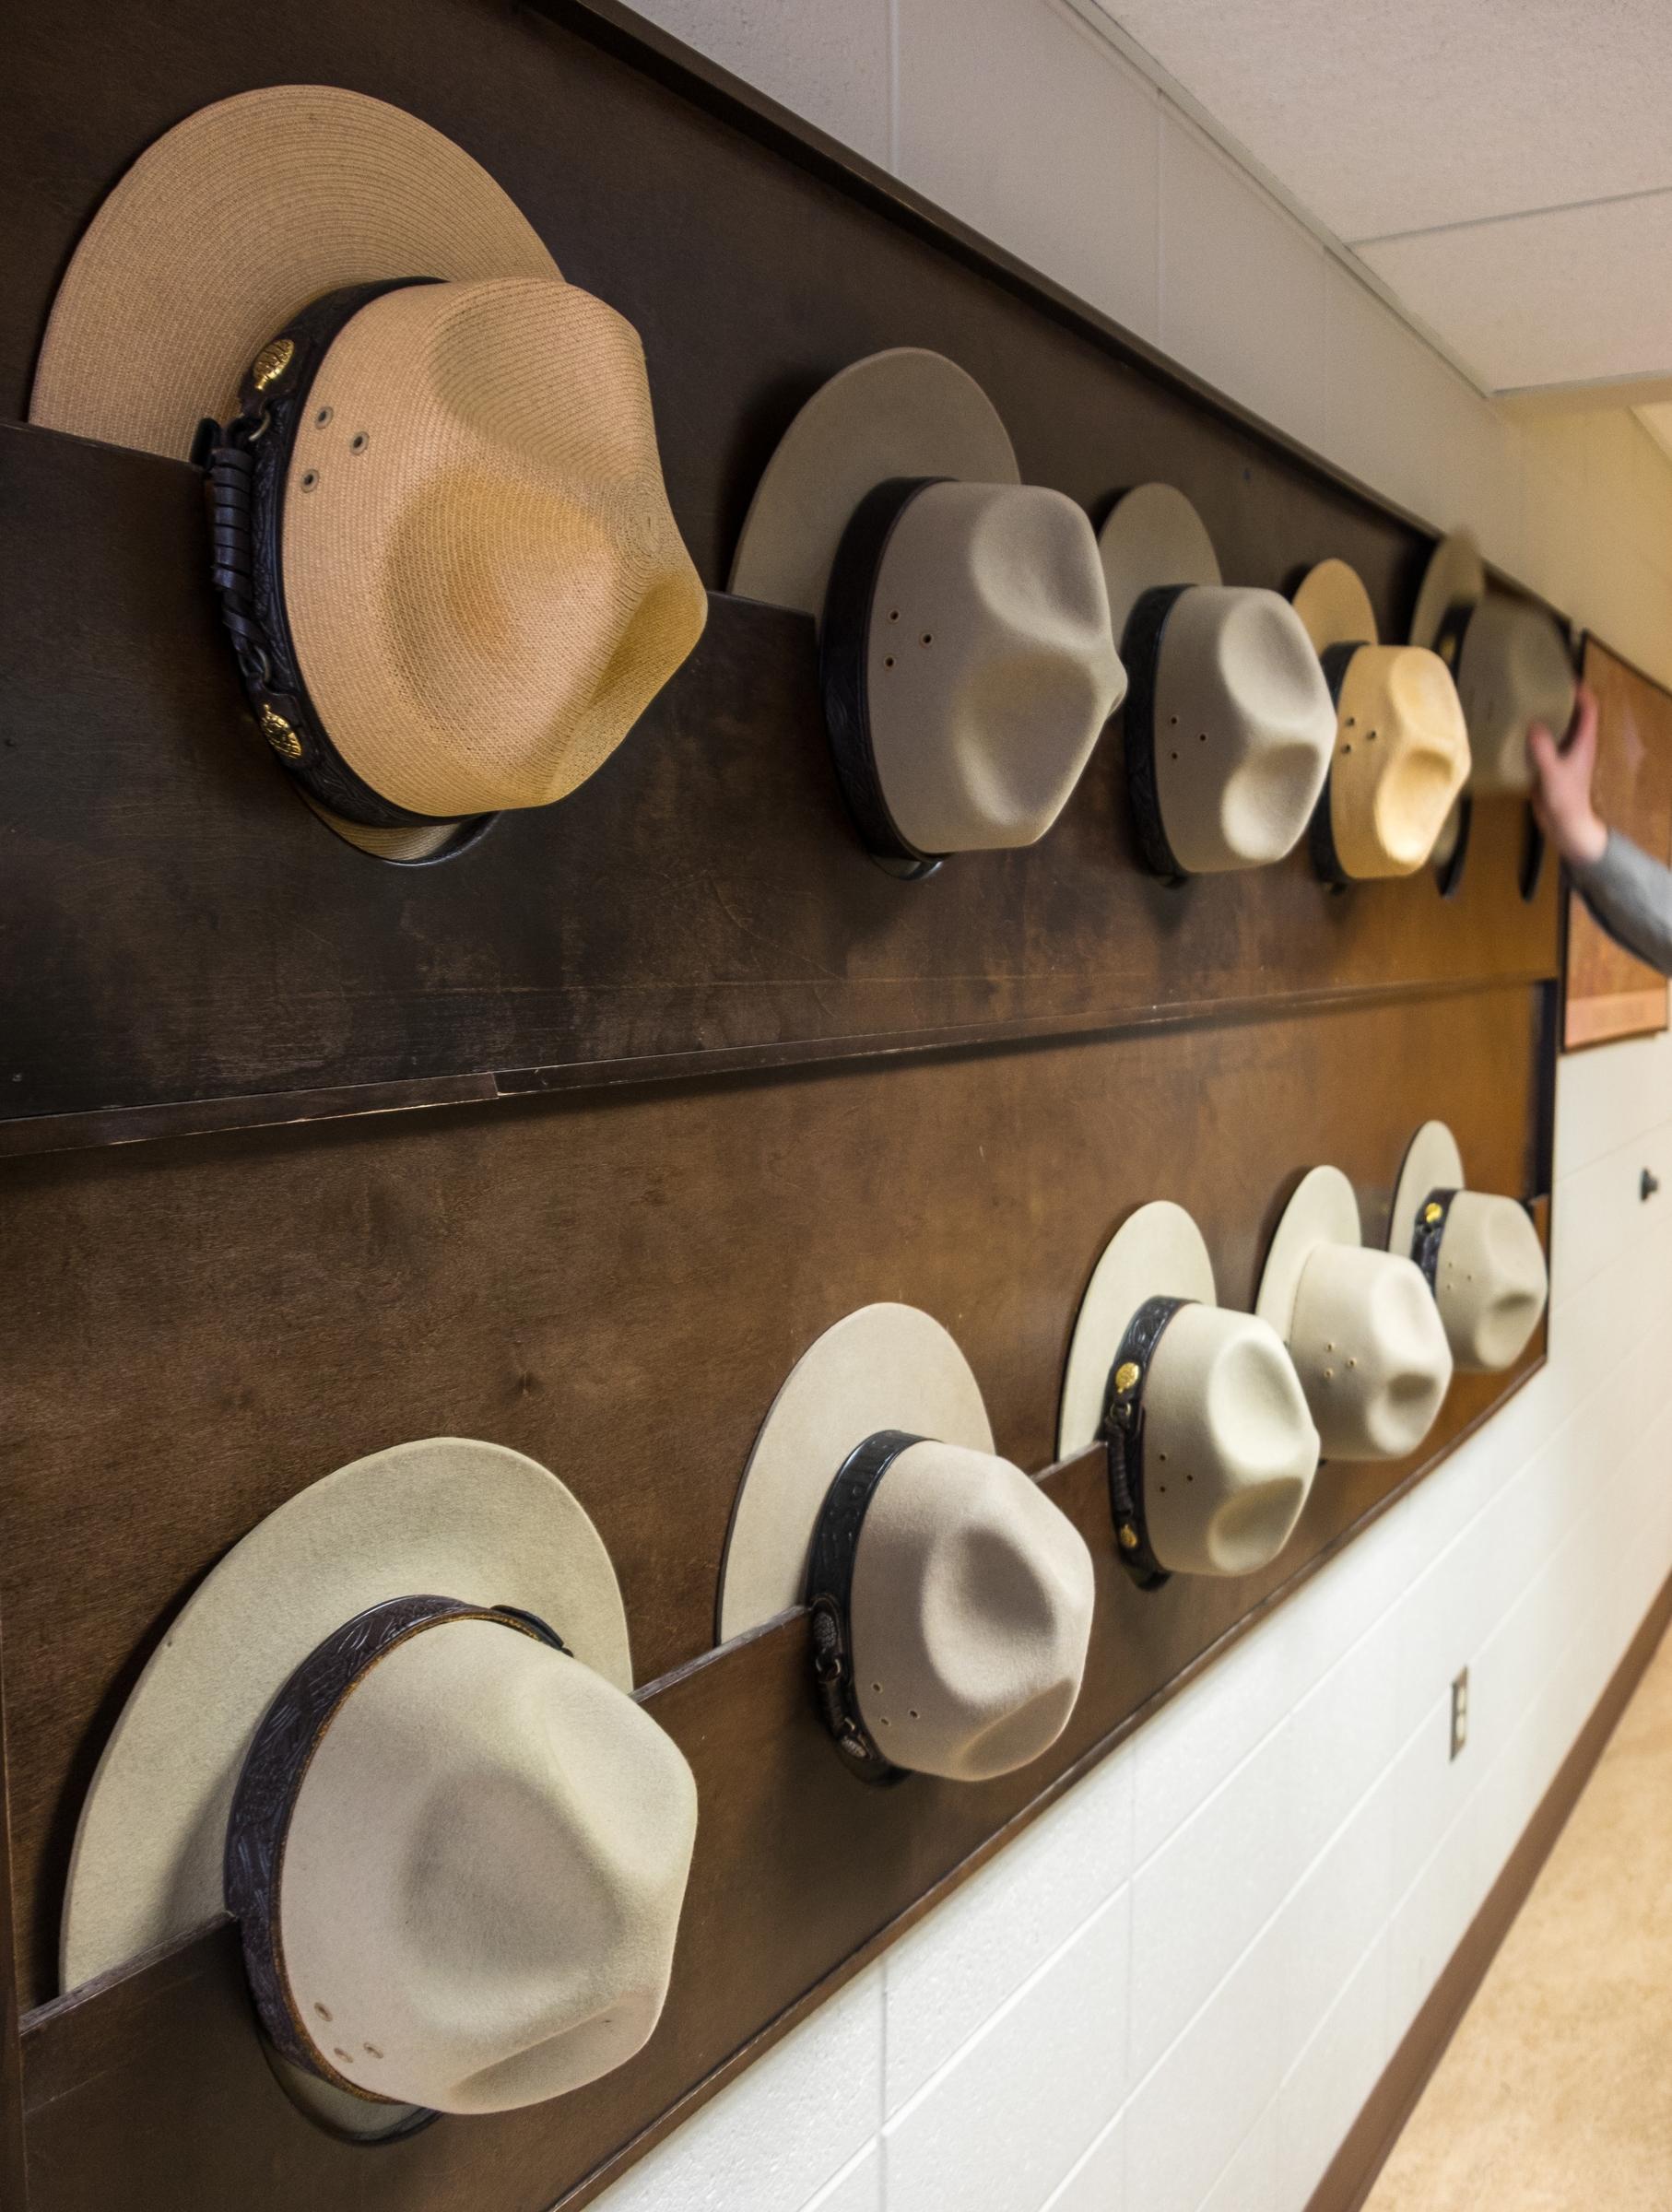 National Park Service ranger hats at Mammoth Cave National Park.   Photo credit: Jonathan Irish #59in52